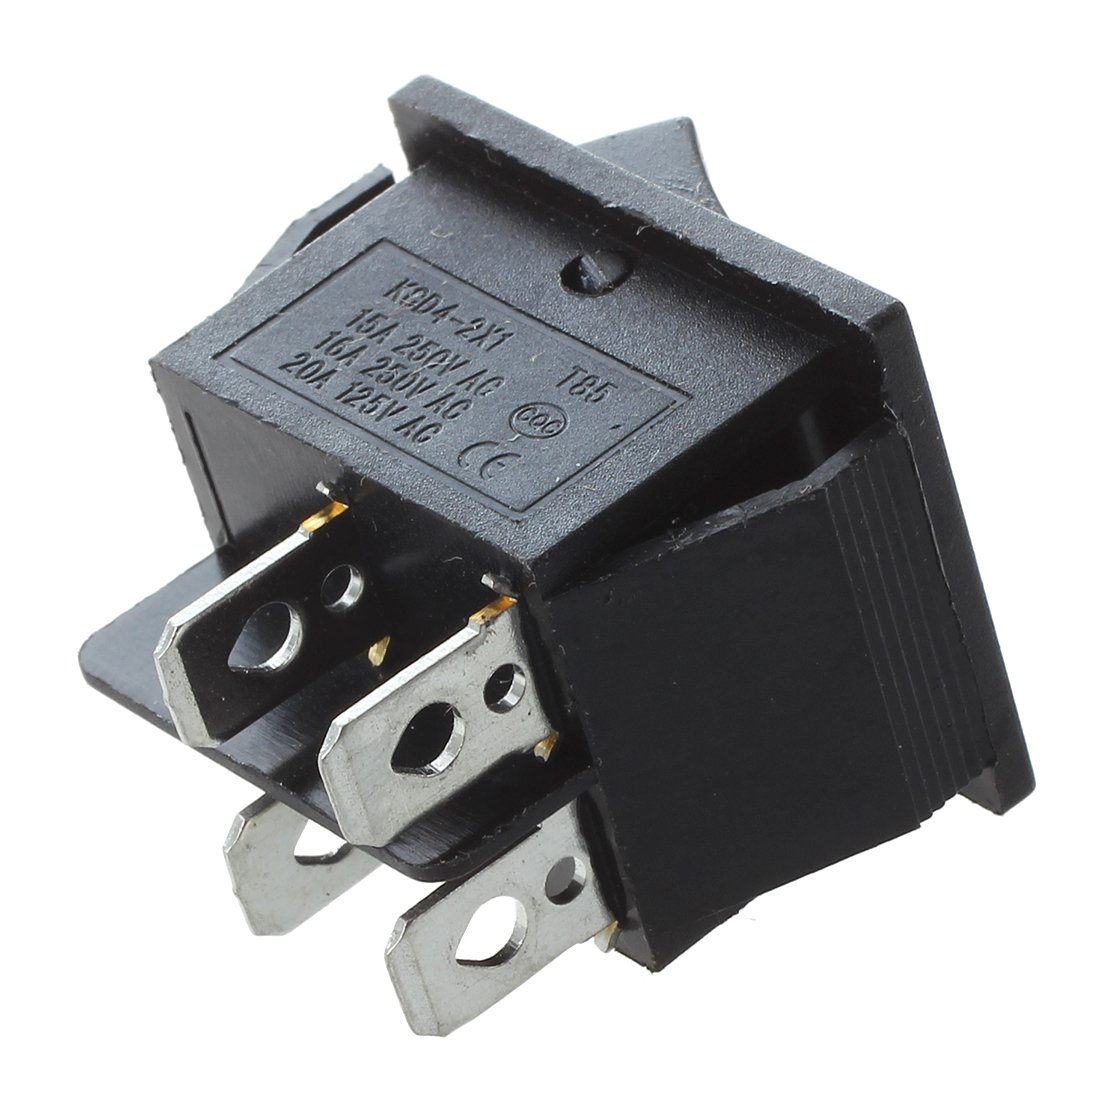 15A 125V 20A BNFUK 2 Pcs Negro 4 Pins DPST On//Off Interruptor Basculante AC 250V